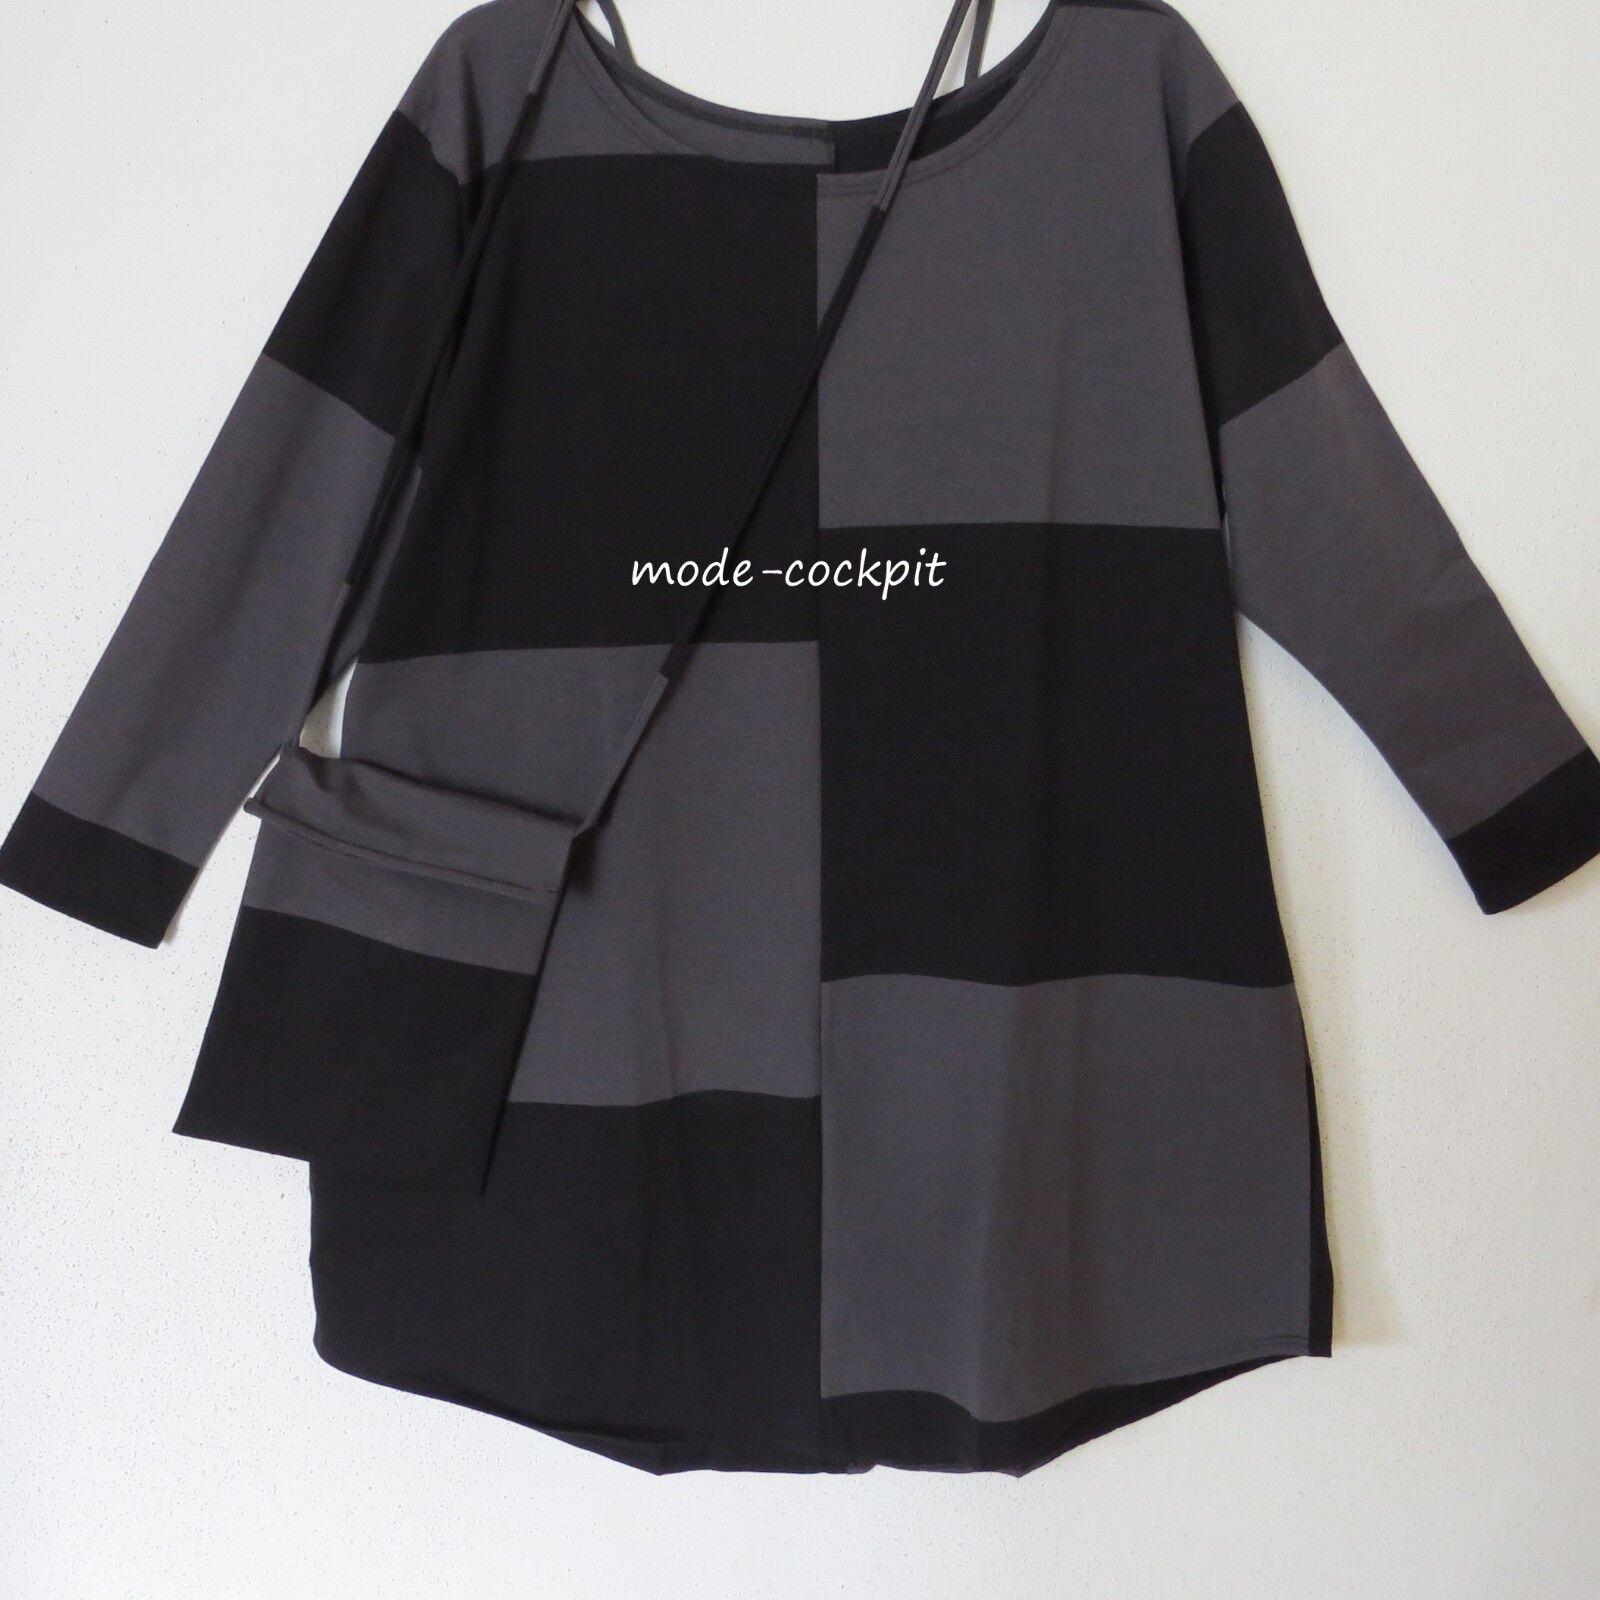 BORIS INDUSTRIES Traum Tunika Long Shirt+Tasche Patch schwarz-grau 44-48 (2)